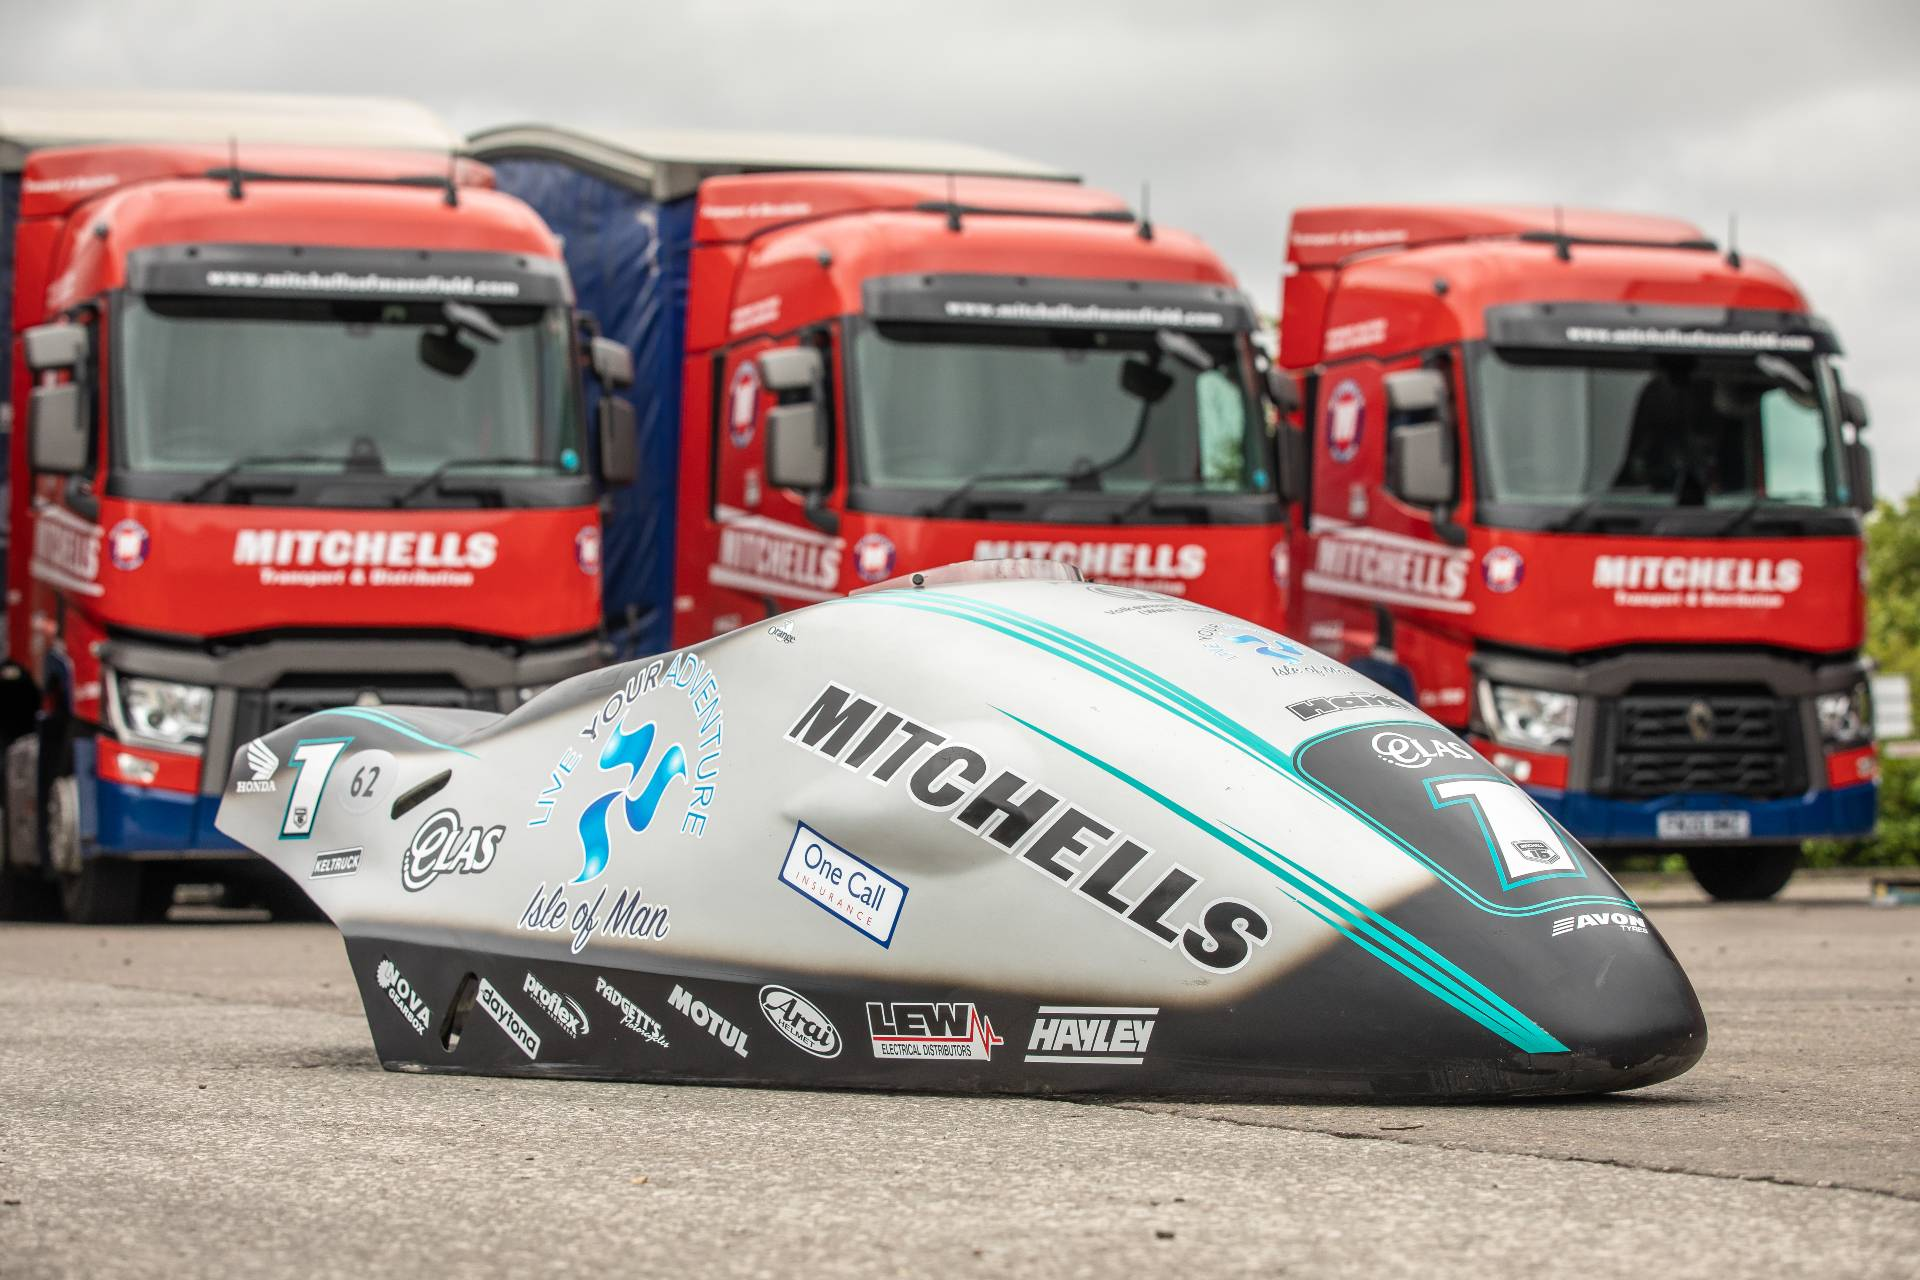 Mitchells Sponsor Sidecar World Champions the Birchall Brothers